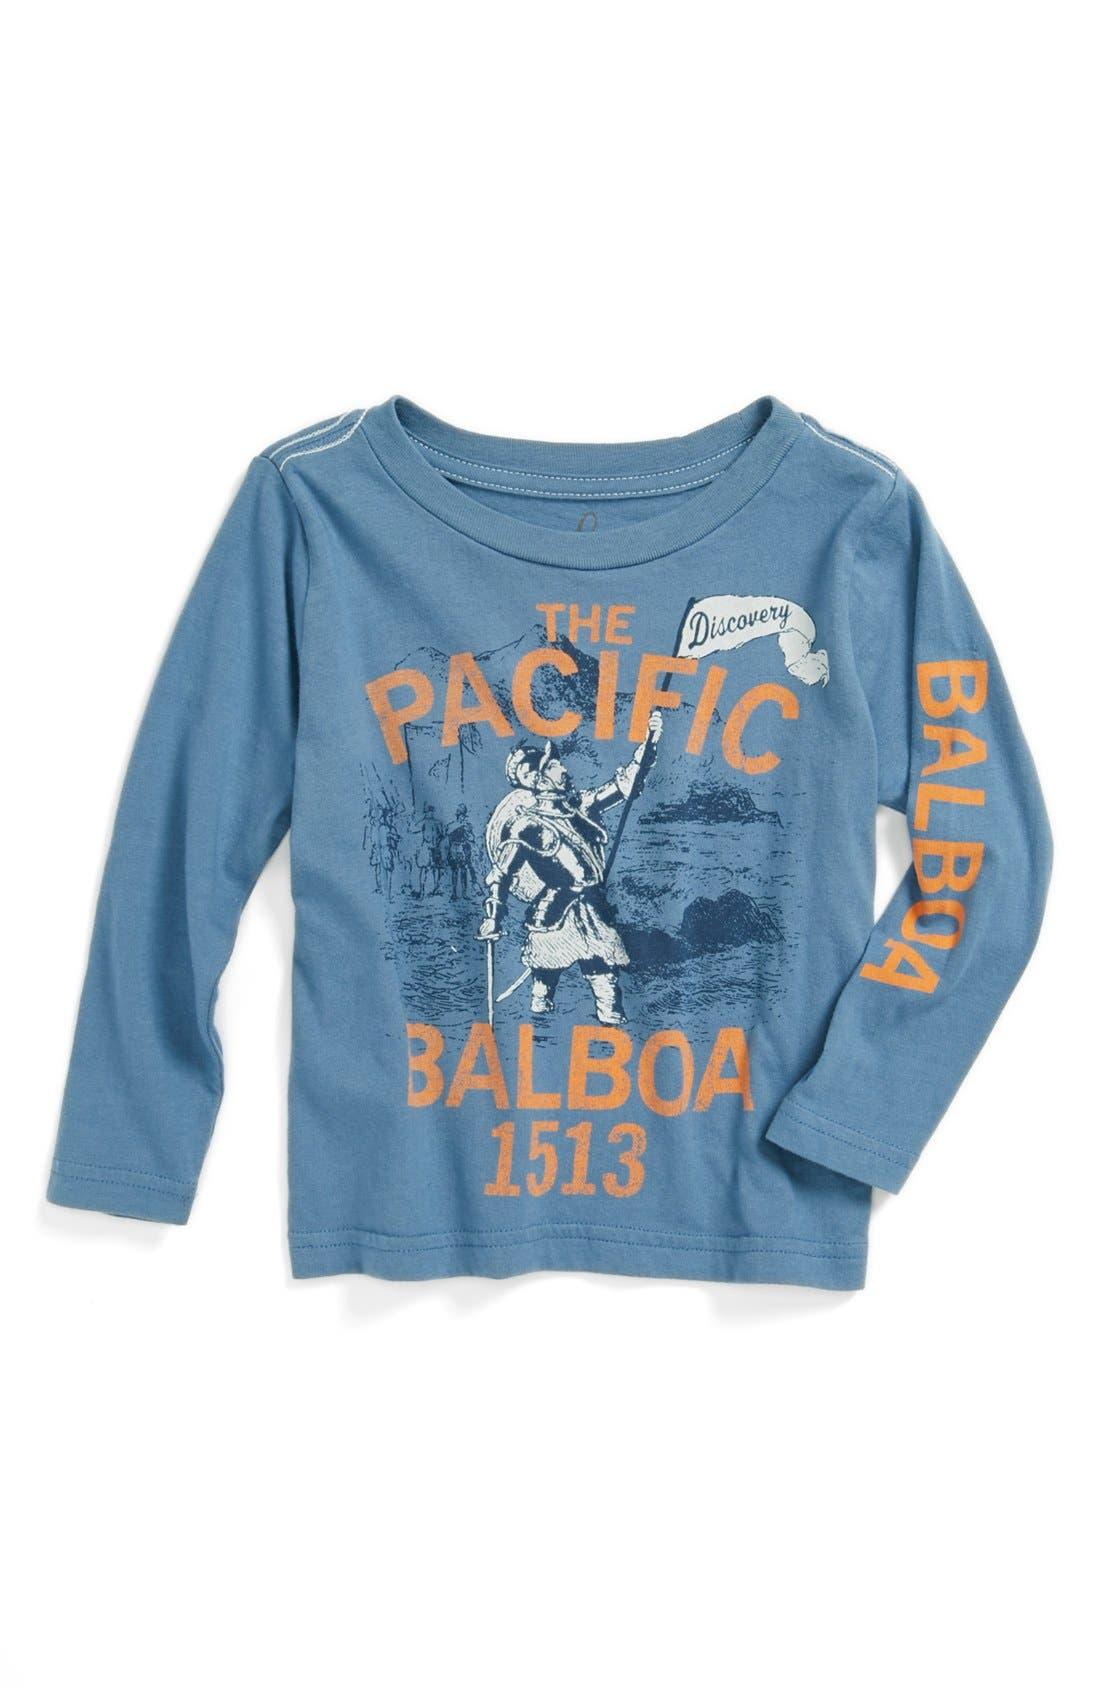 Alternate Image 1 Selected - Peek 'Balboa' Long Sleeve T-Shirt (Baby Boys)